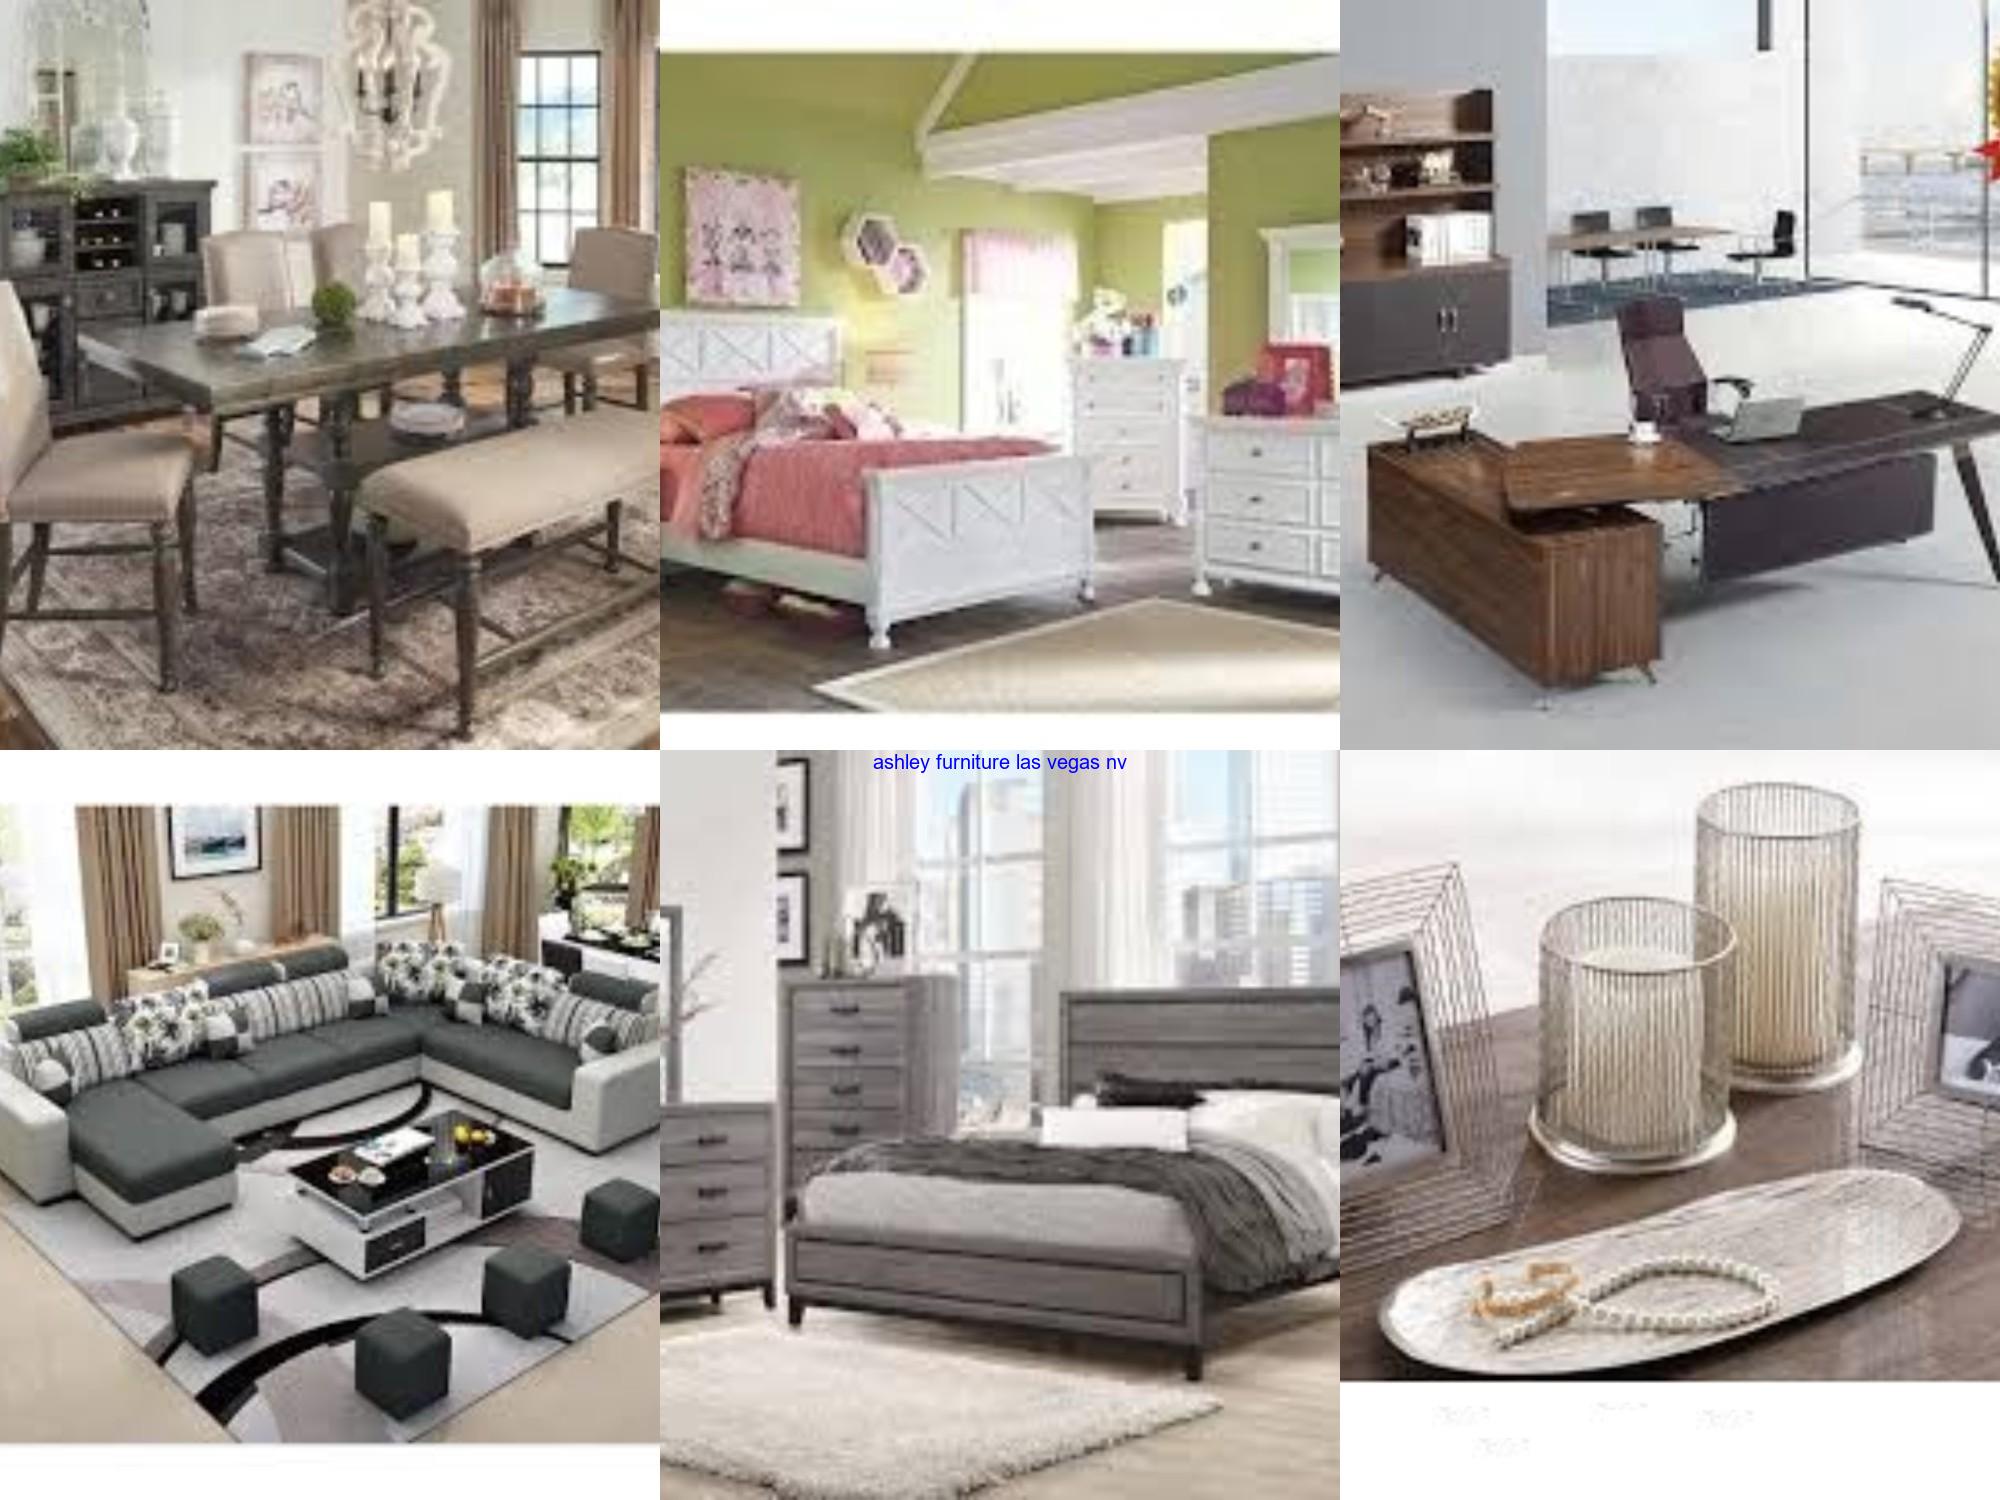 ashley furniture las vegas nv in 13  Bed, Sofa, Armen